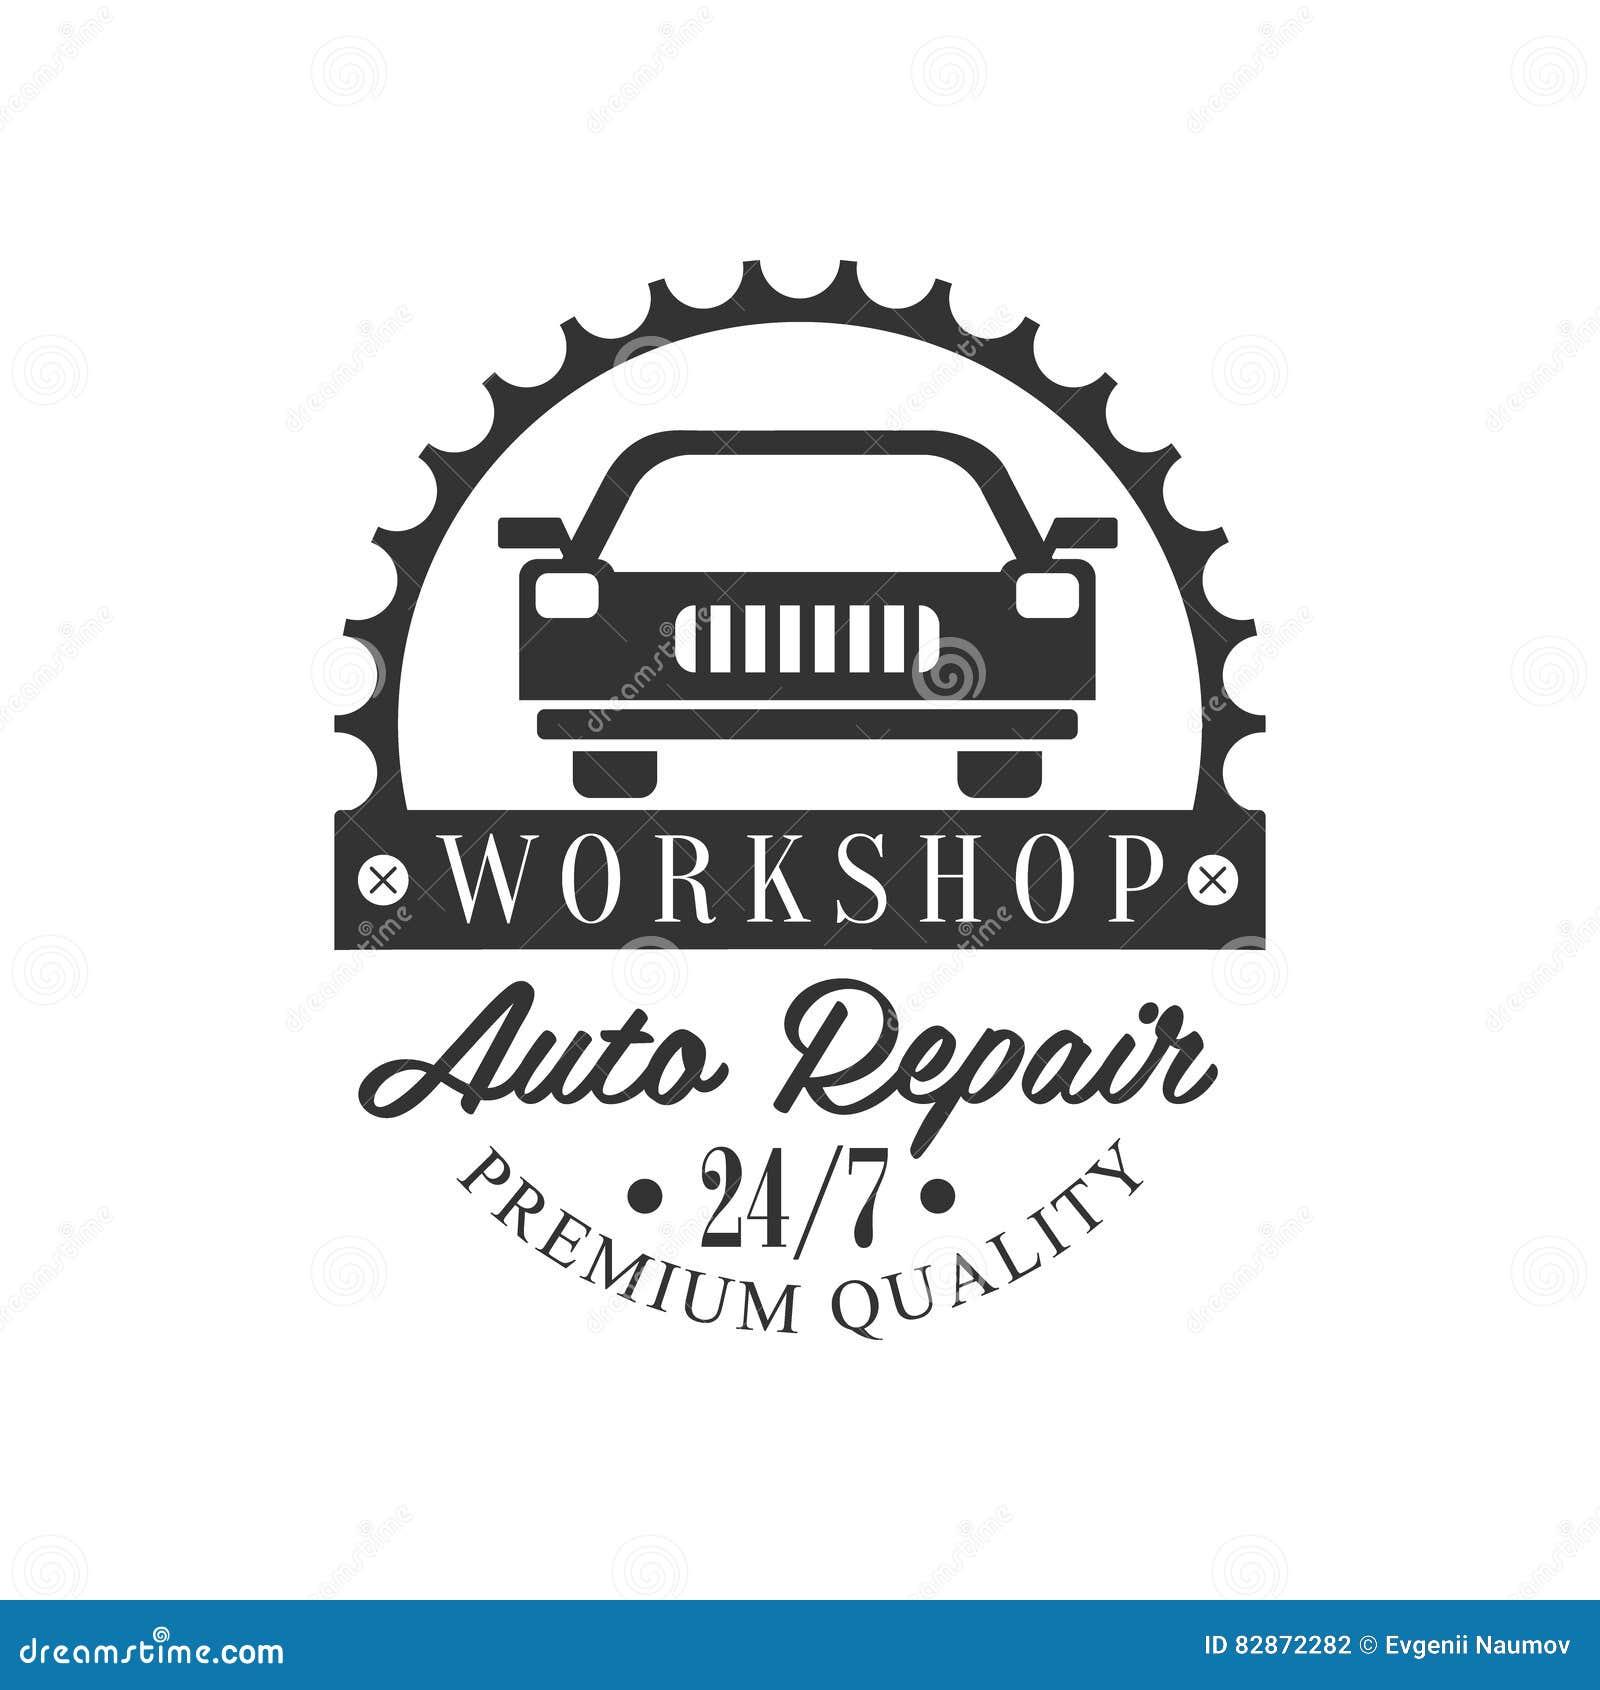 Design car repair workshop - Auto Repair Workshop Black And White Label Design Template With Car Silhouette